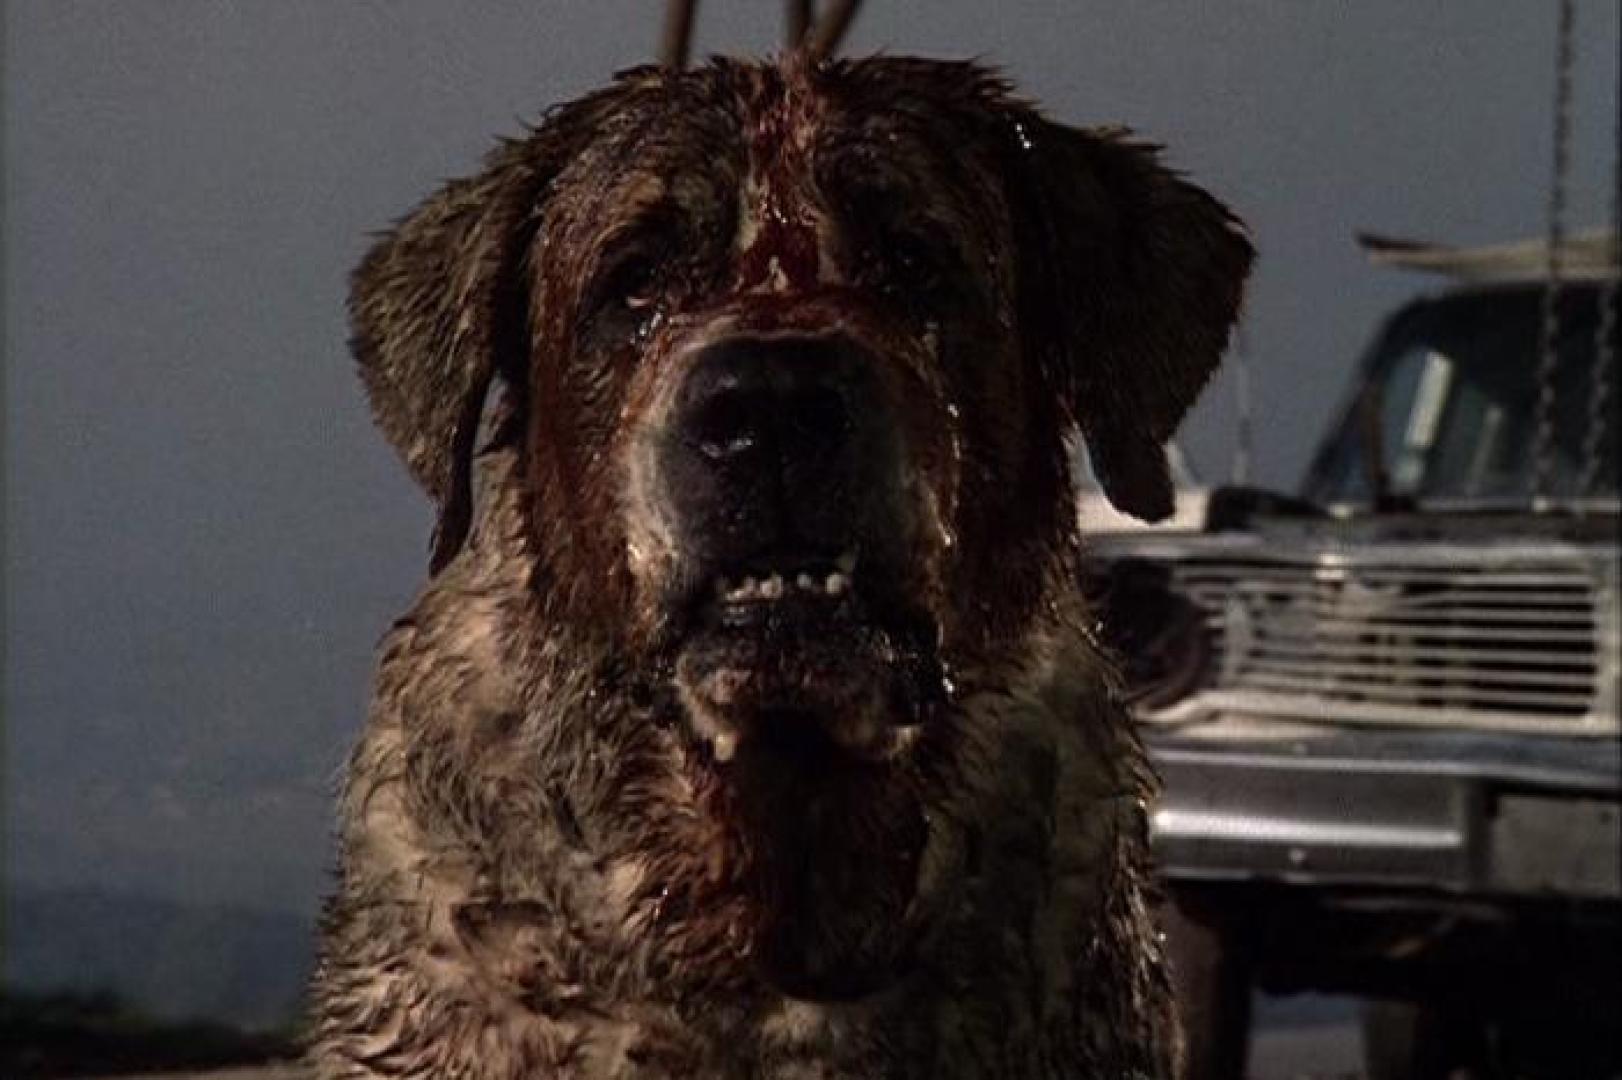 Stephen King: Cujo (1981/1983)